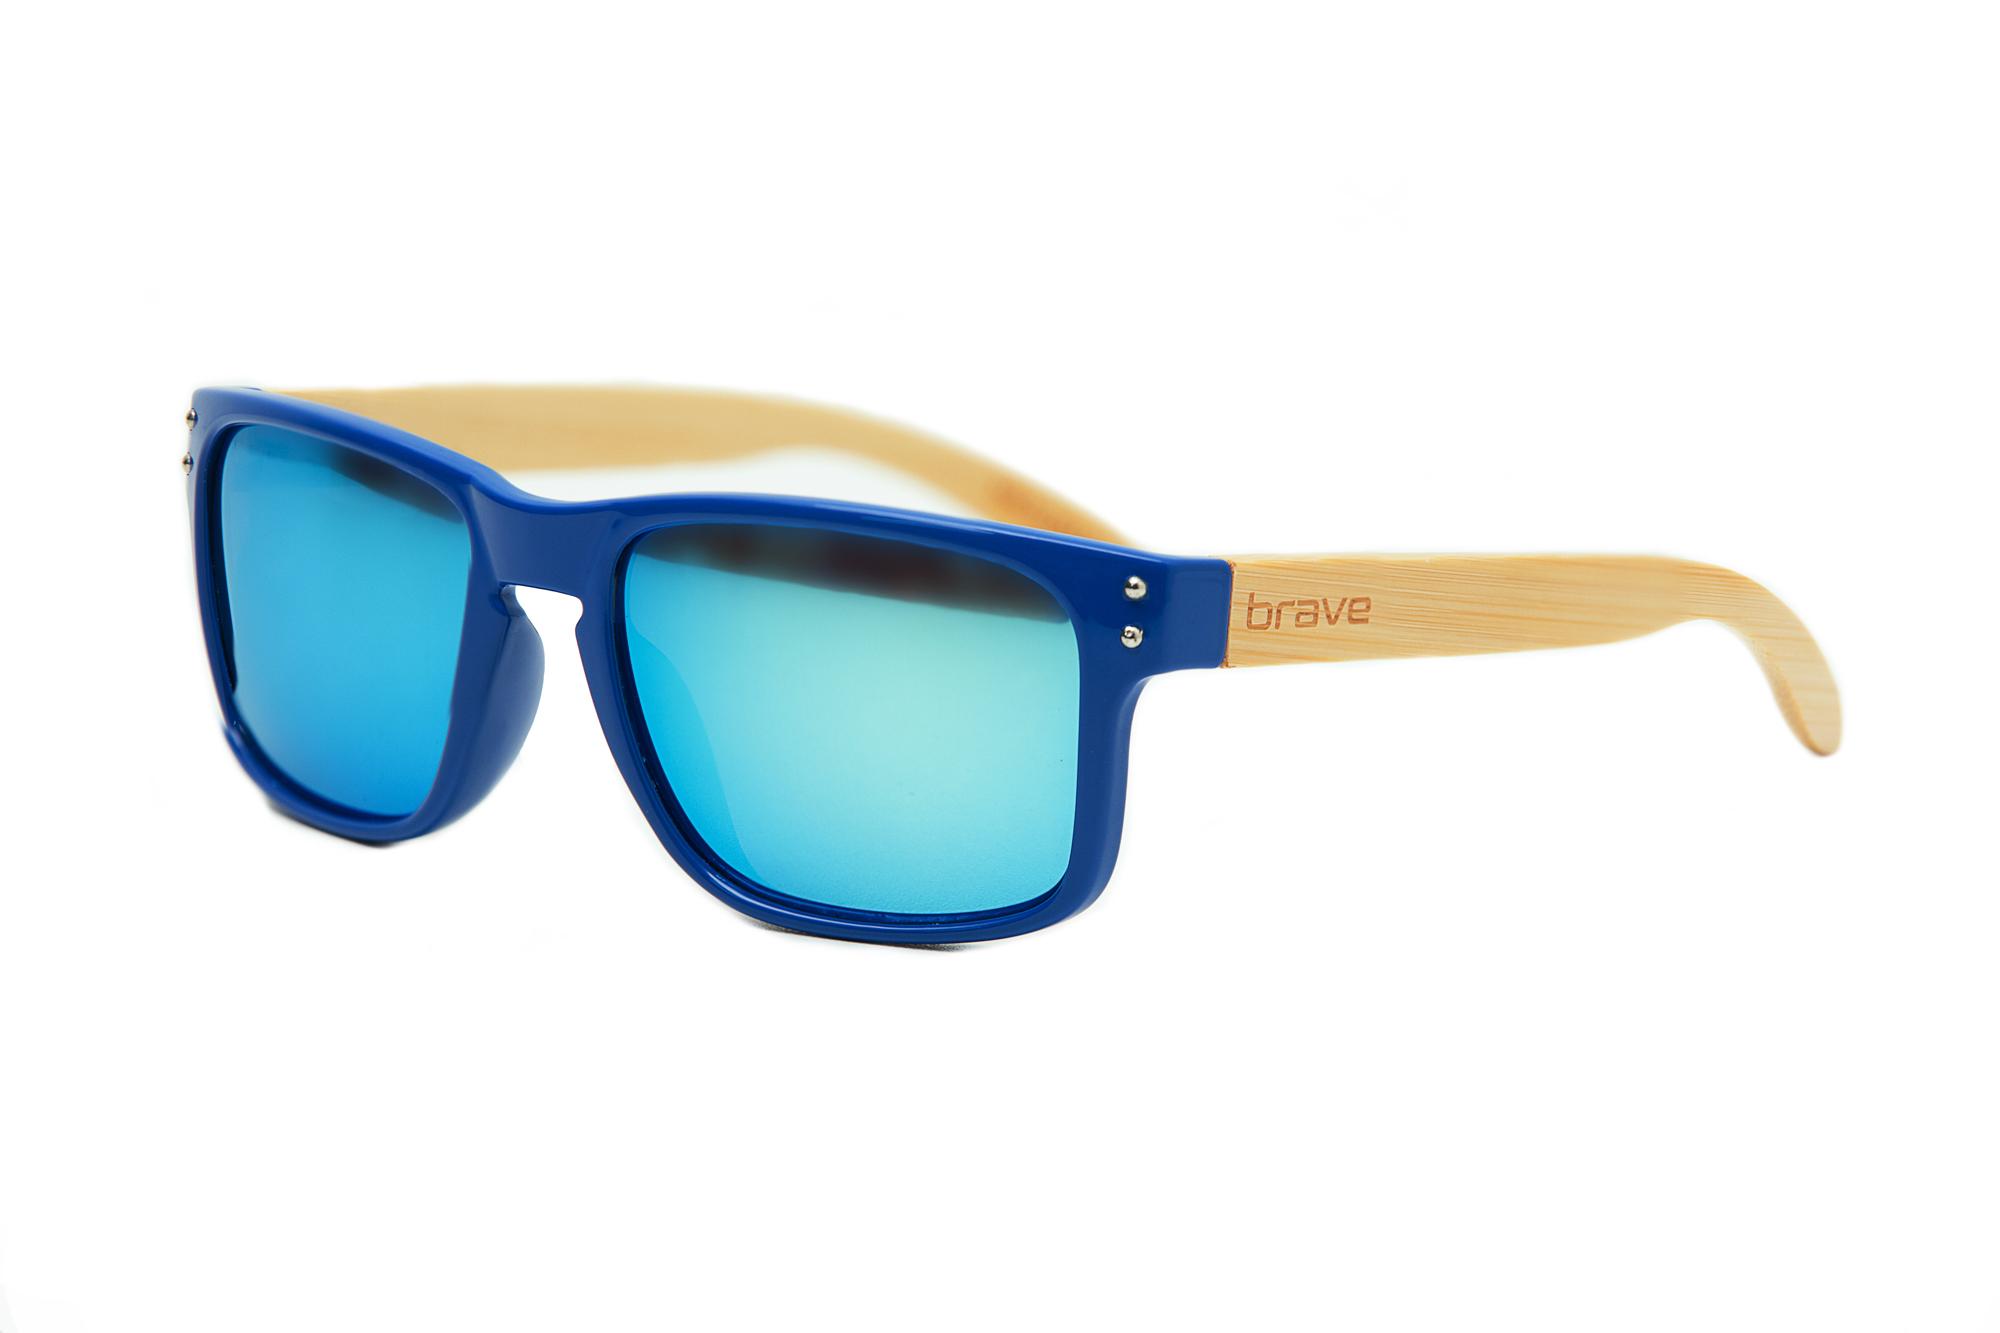 Miami – Blue/Iced Blue